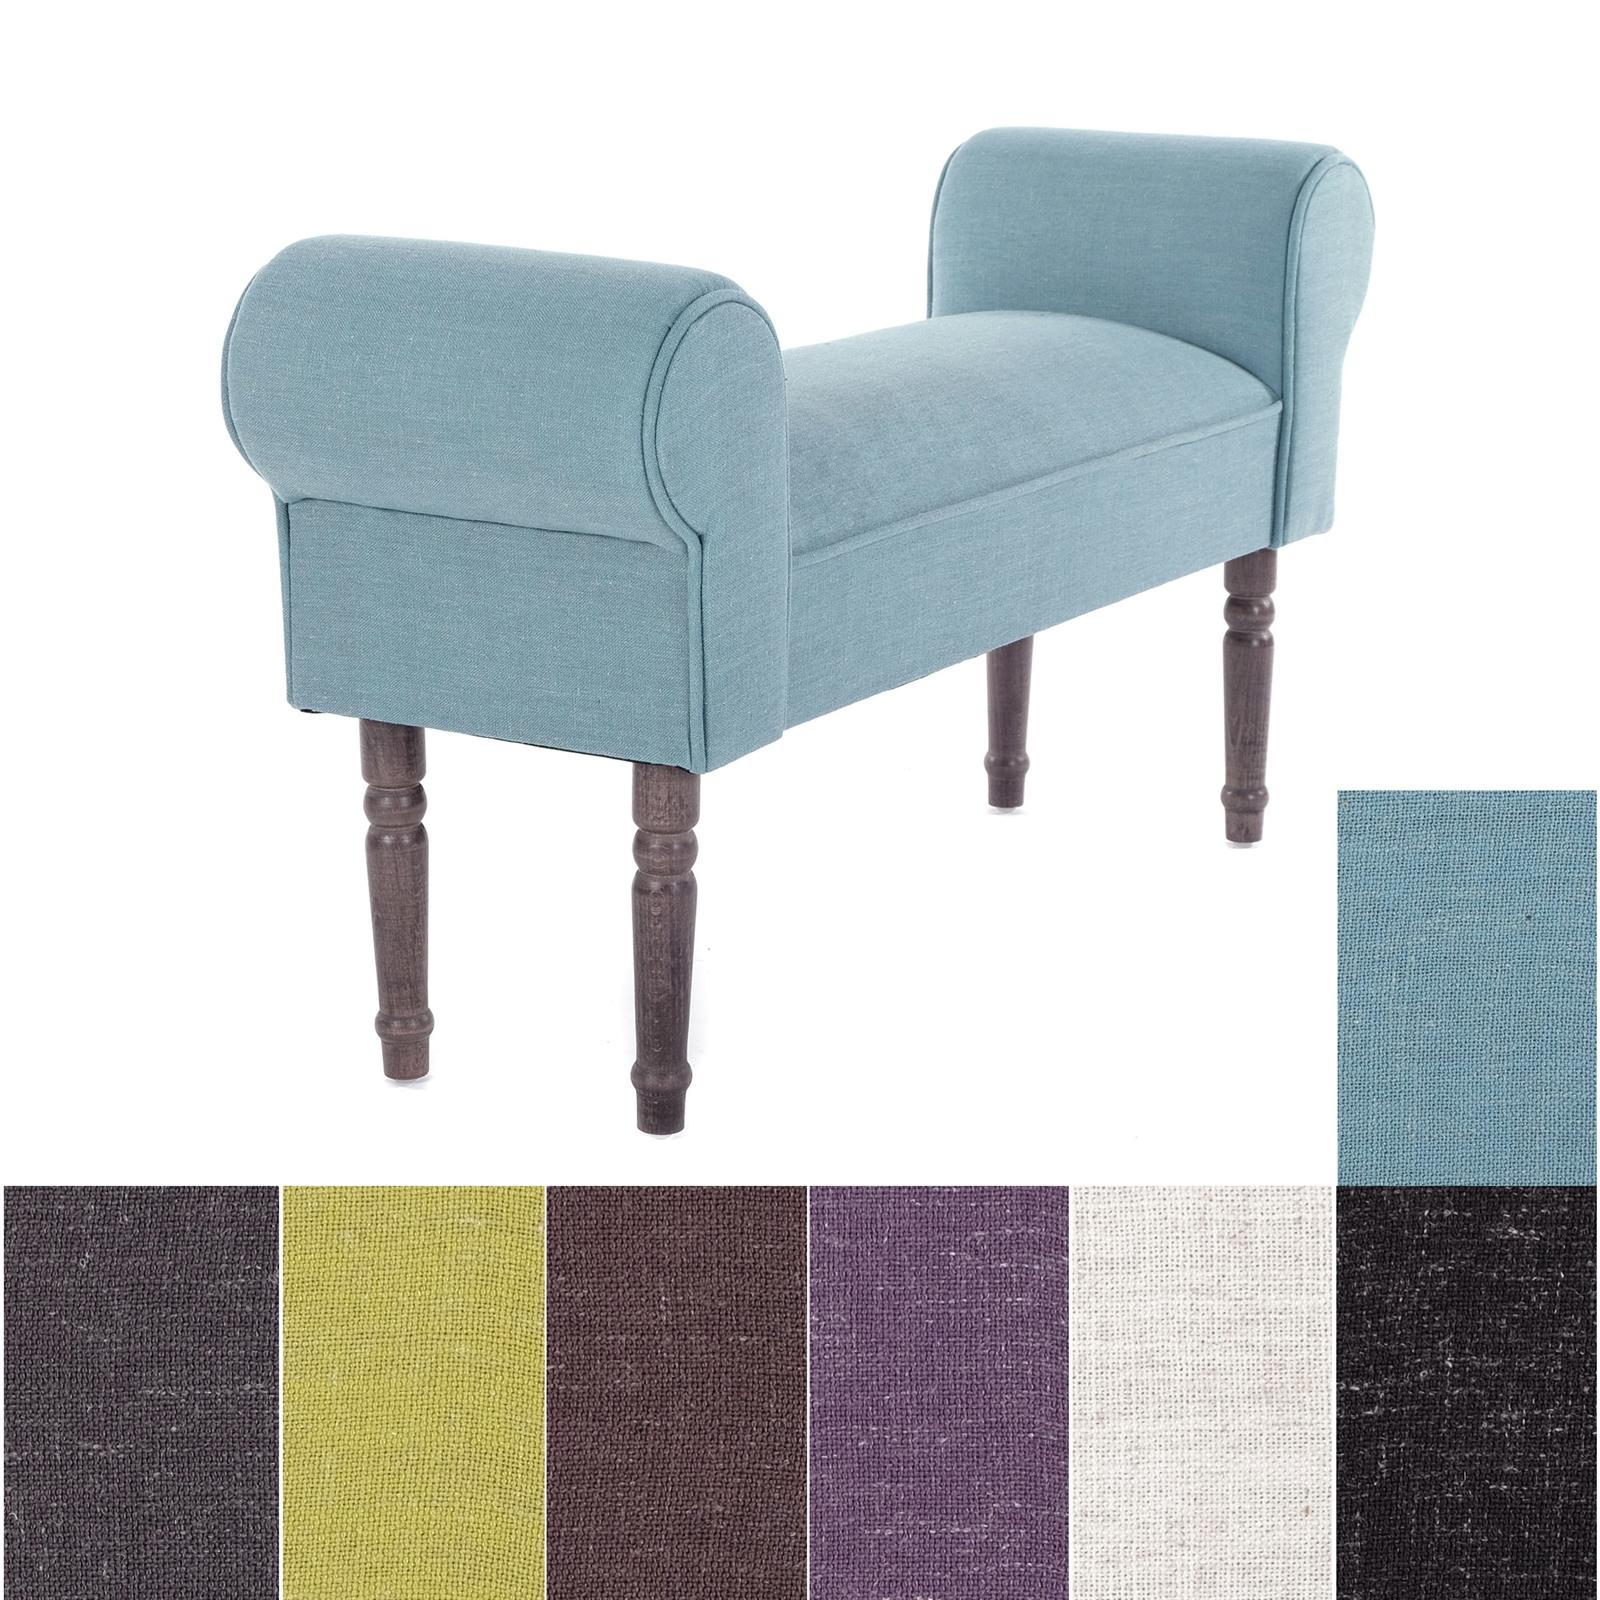 design sitzbank linello vers farben 100cm gepolstert polsterbank flurbank ebay. Black Bedroom Furniture Sets. Home Design Ideas